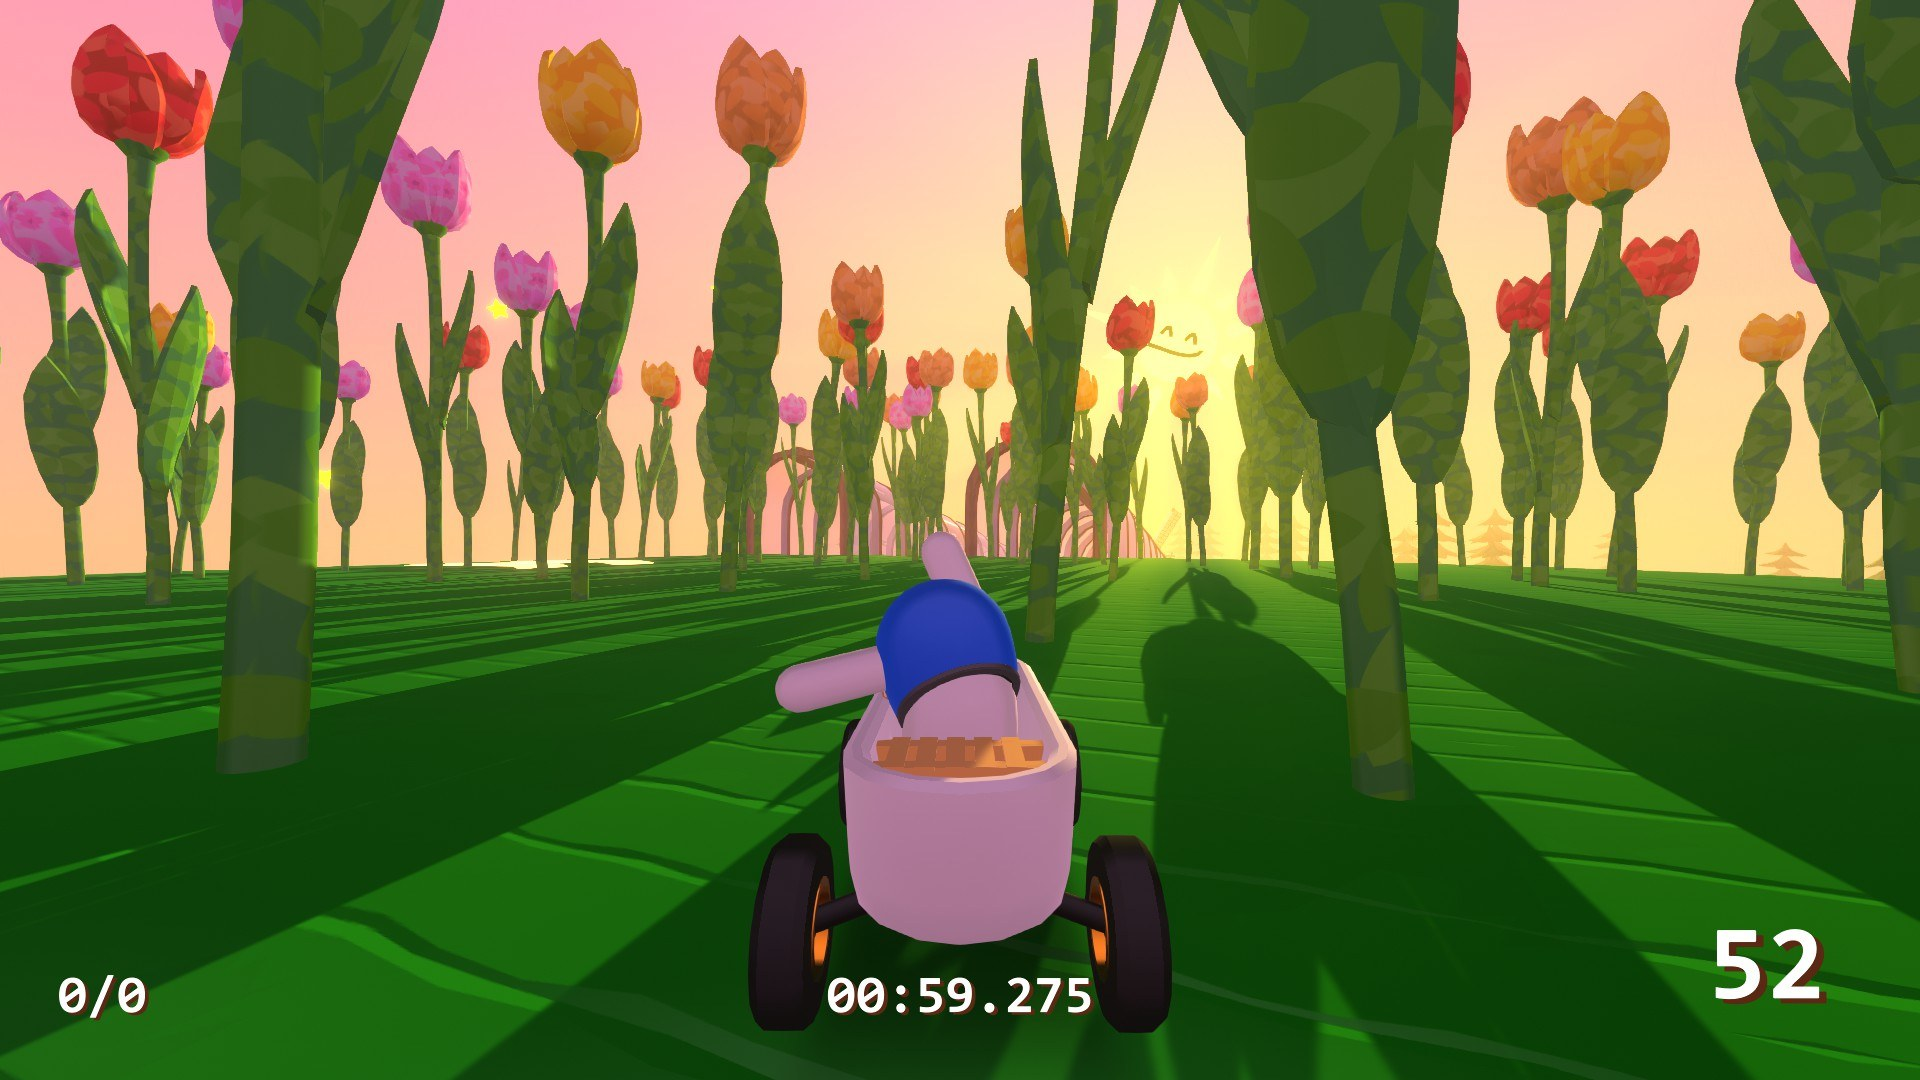 Zeepkist - Flowers